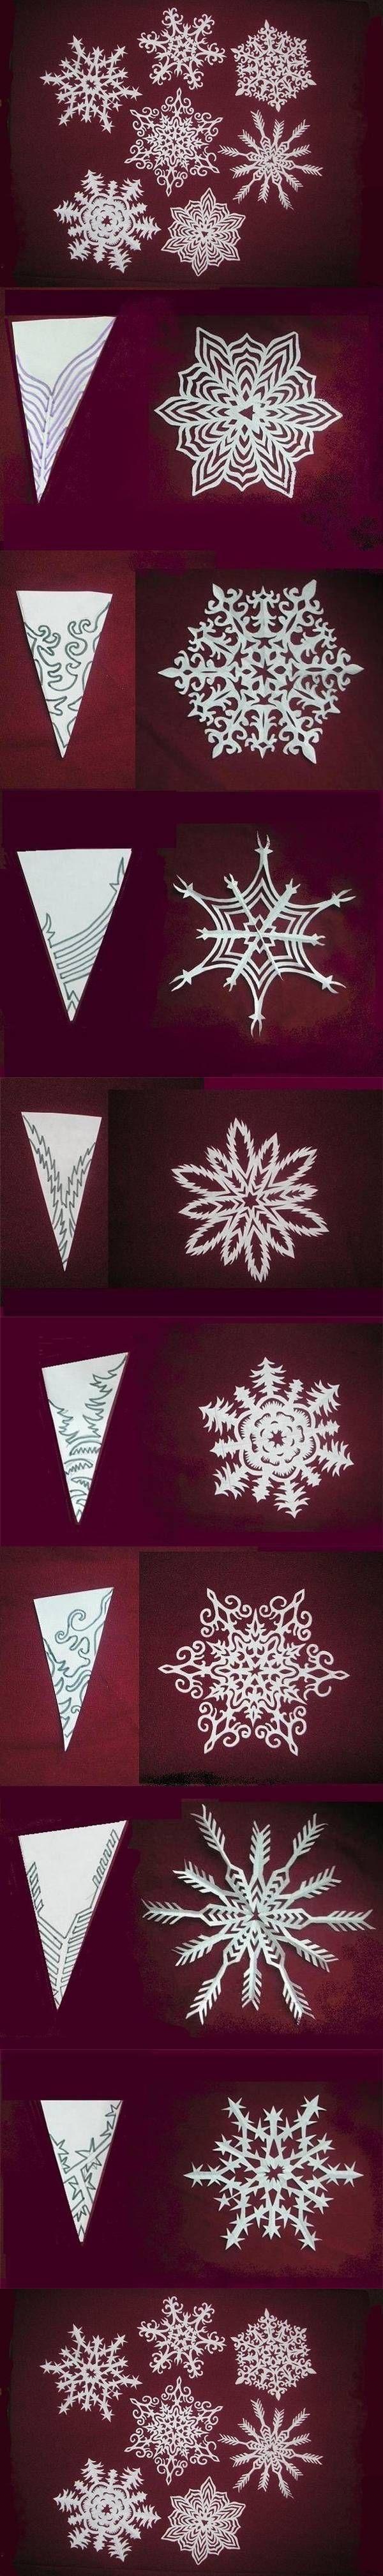 DIY Snowflakes Paper Pattern